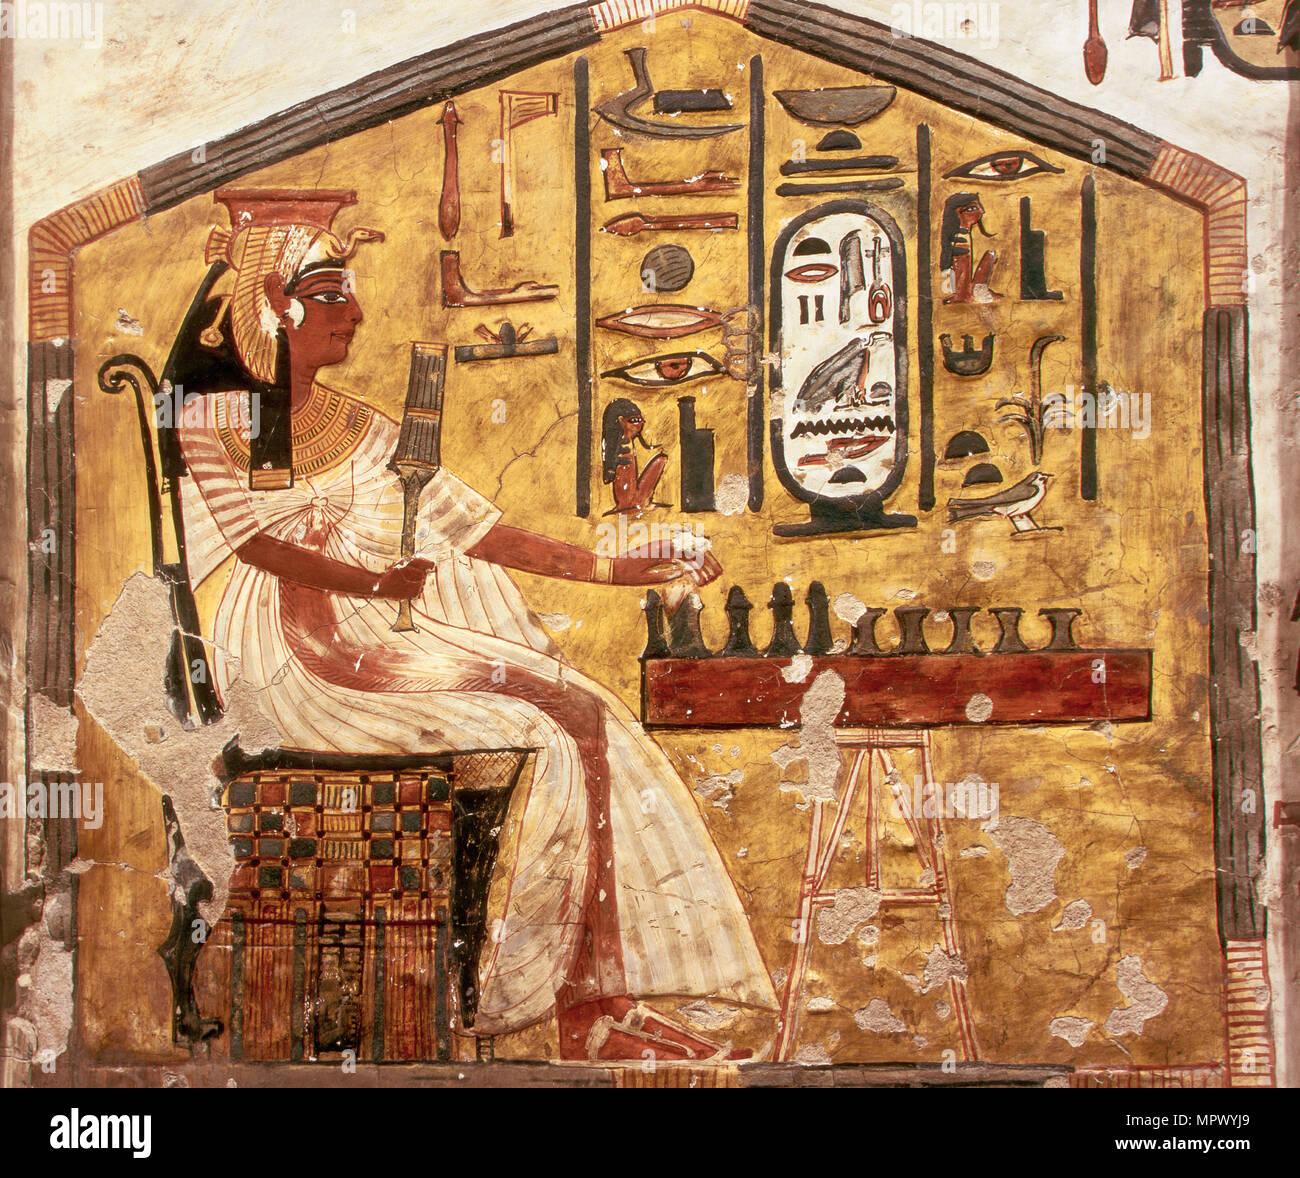 Queen Nefertari Playing Senet. The tomb of Nefertari, the Wife of Pharaoh Ramesses II, ca 1298-1235 - Stock Image